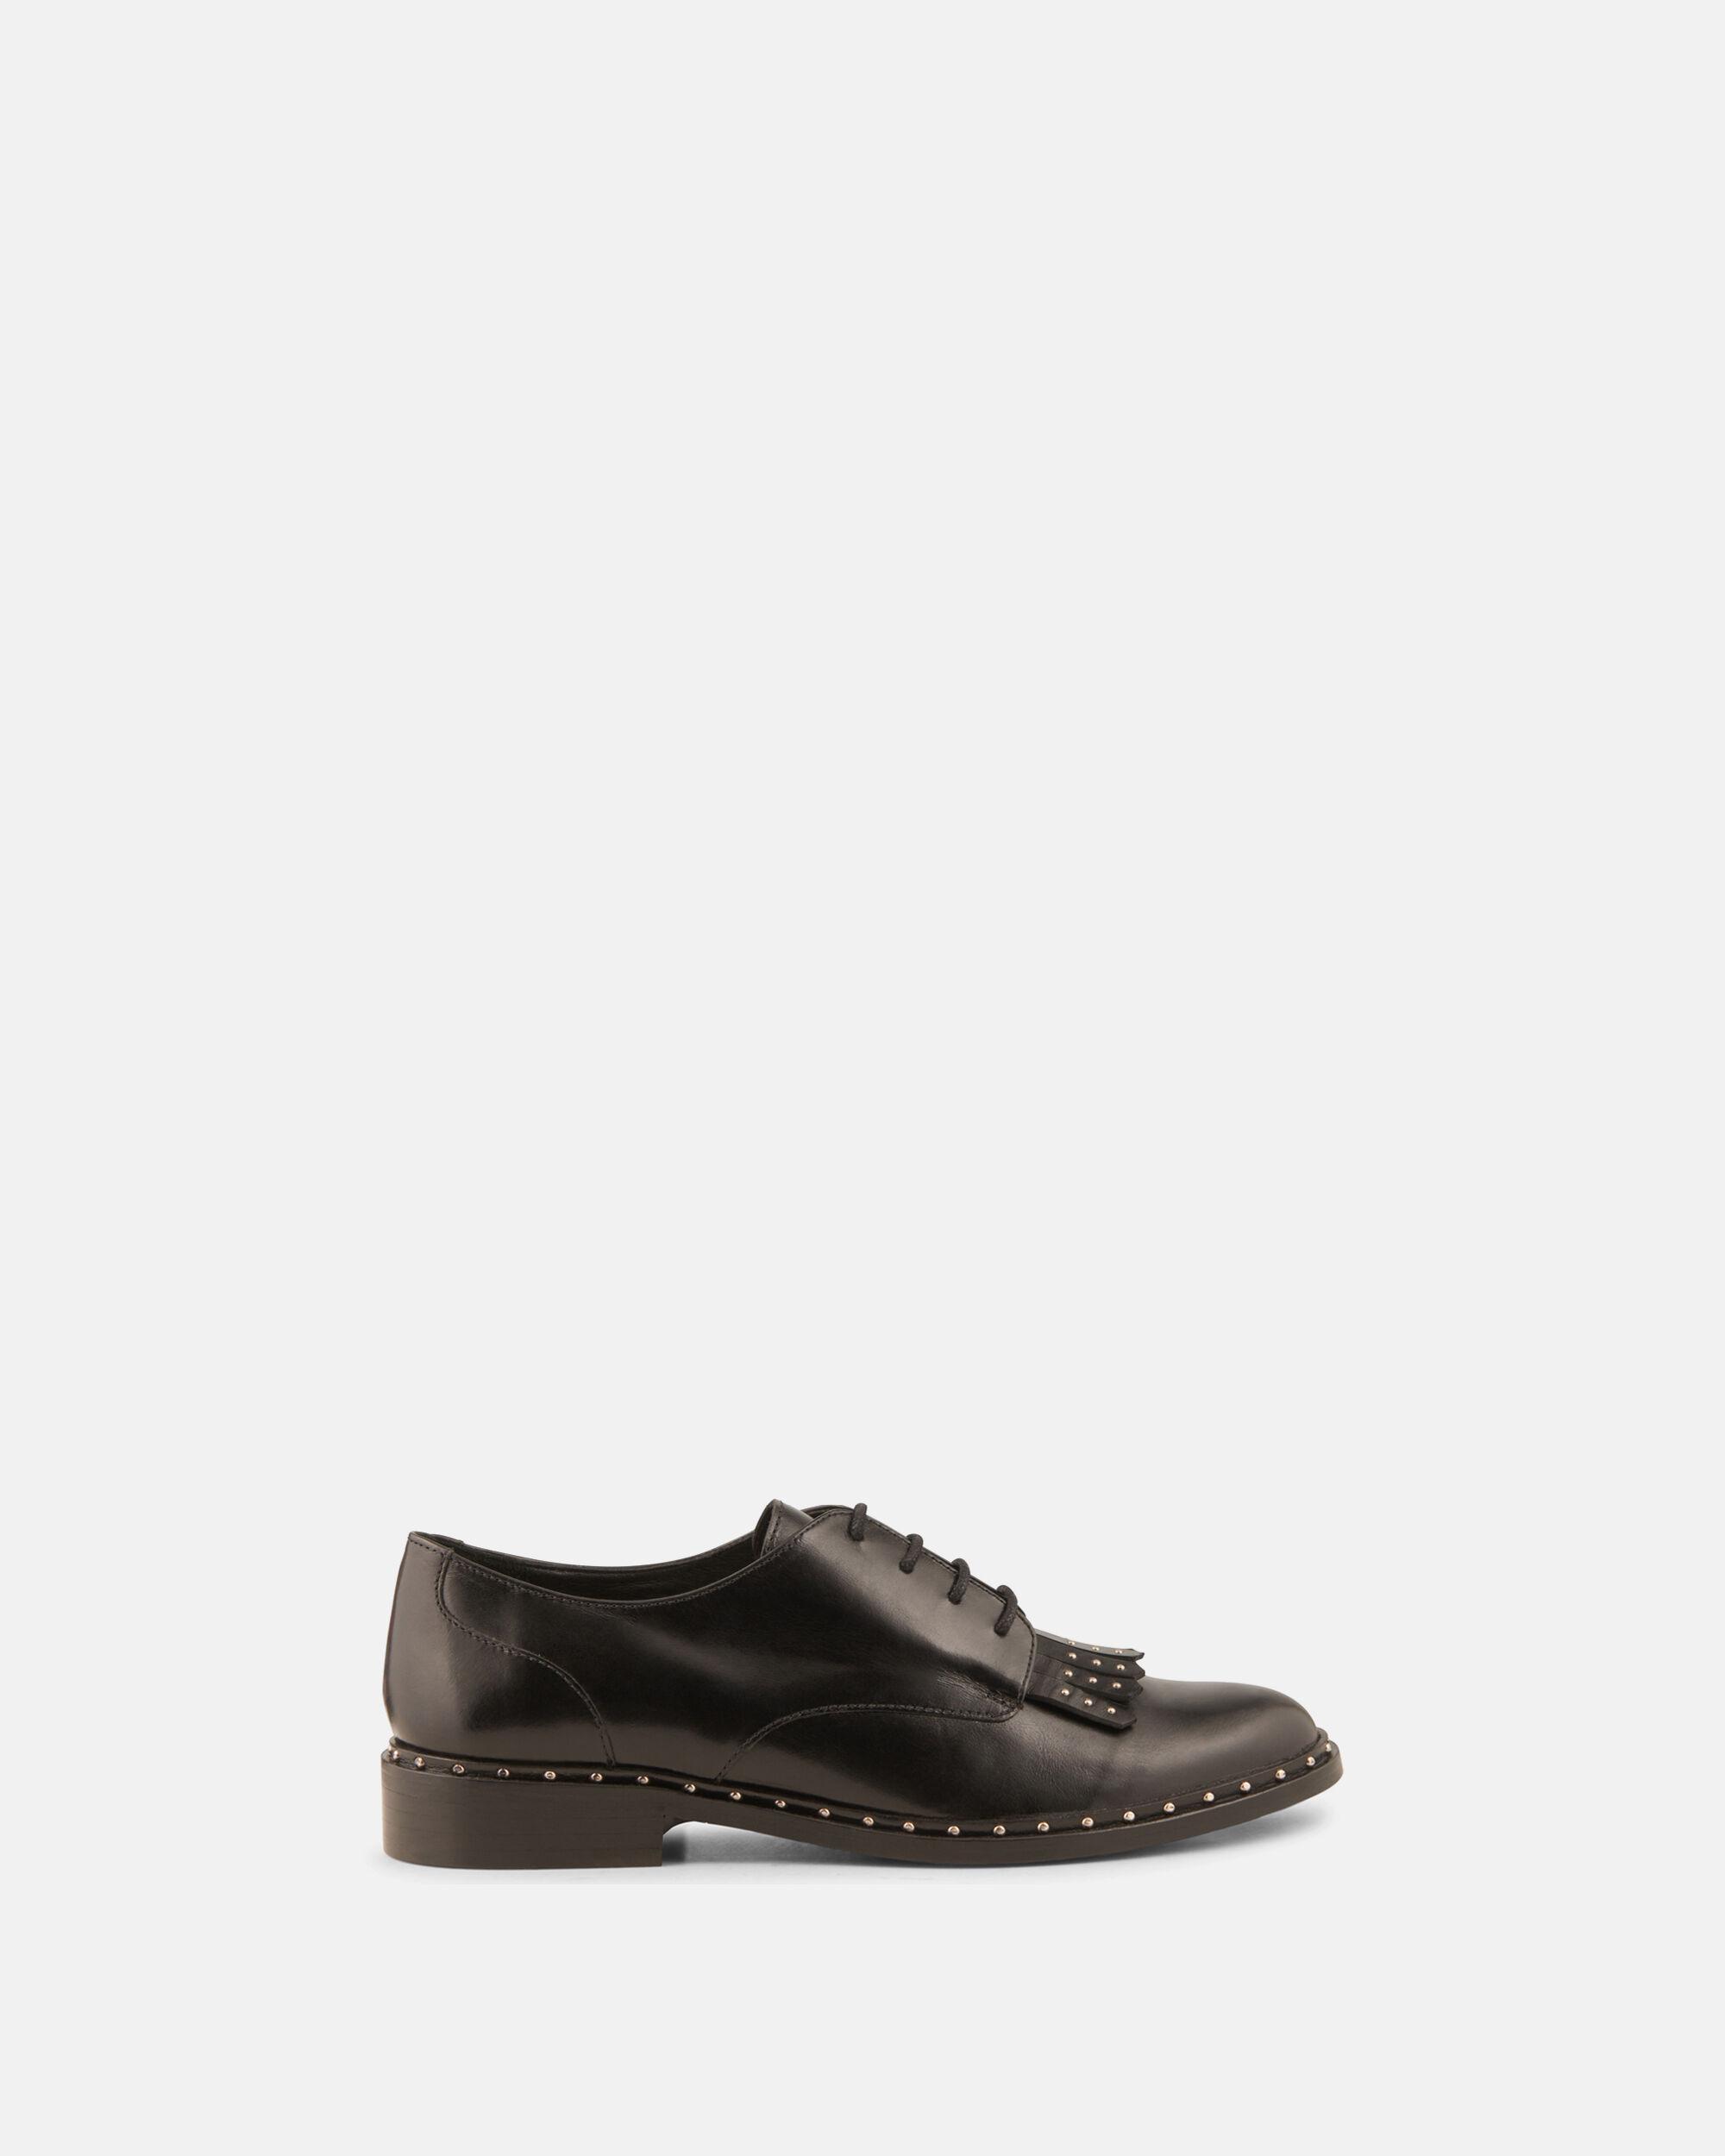 chaussures Derbies – Derby et femme Minelli femme richelieu clF1KJ